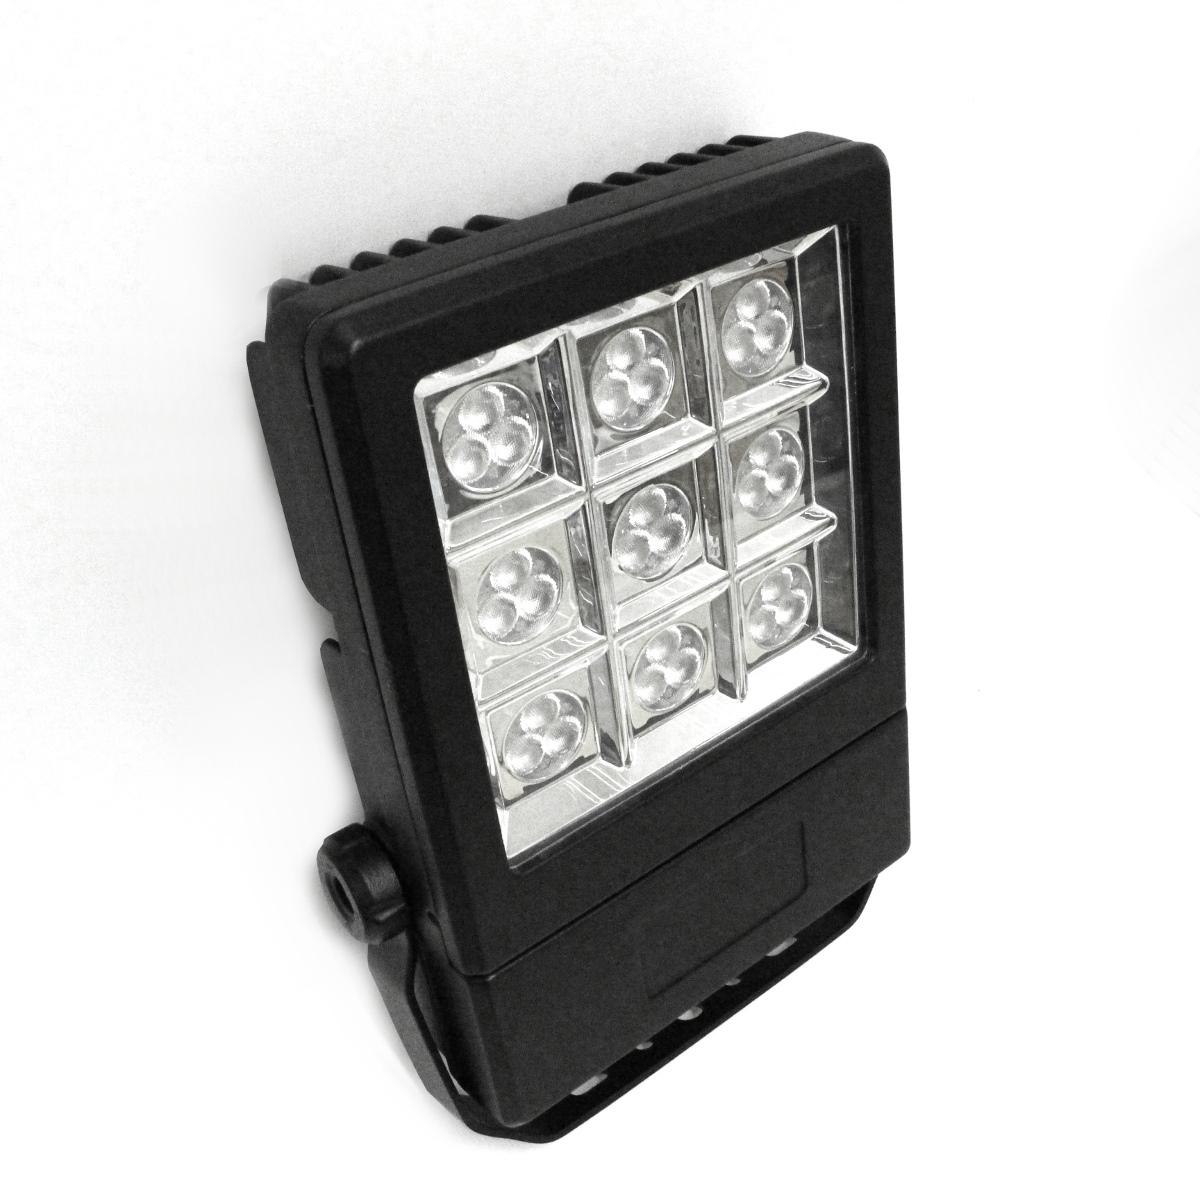 Lampenlux LED Außenleuchte Judy Aluminium Schwarz 48W LED 3500lm 3000K IP65